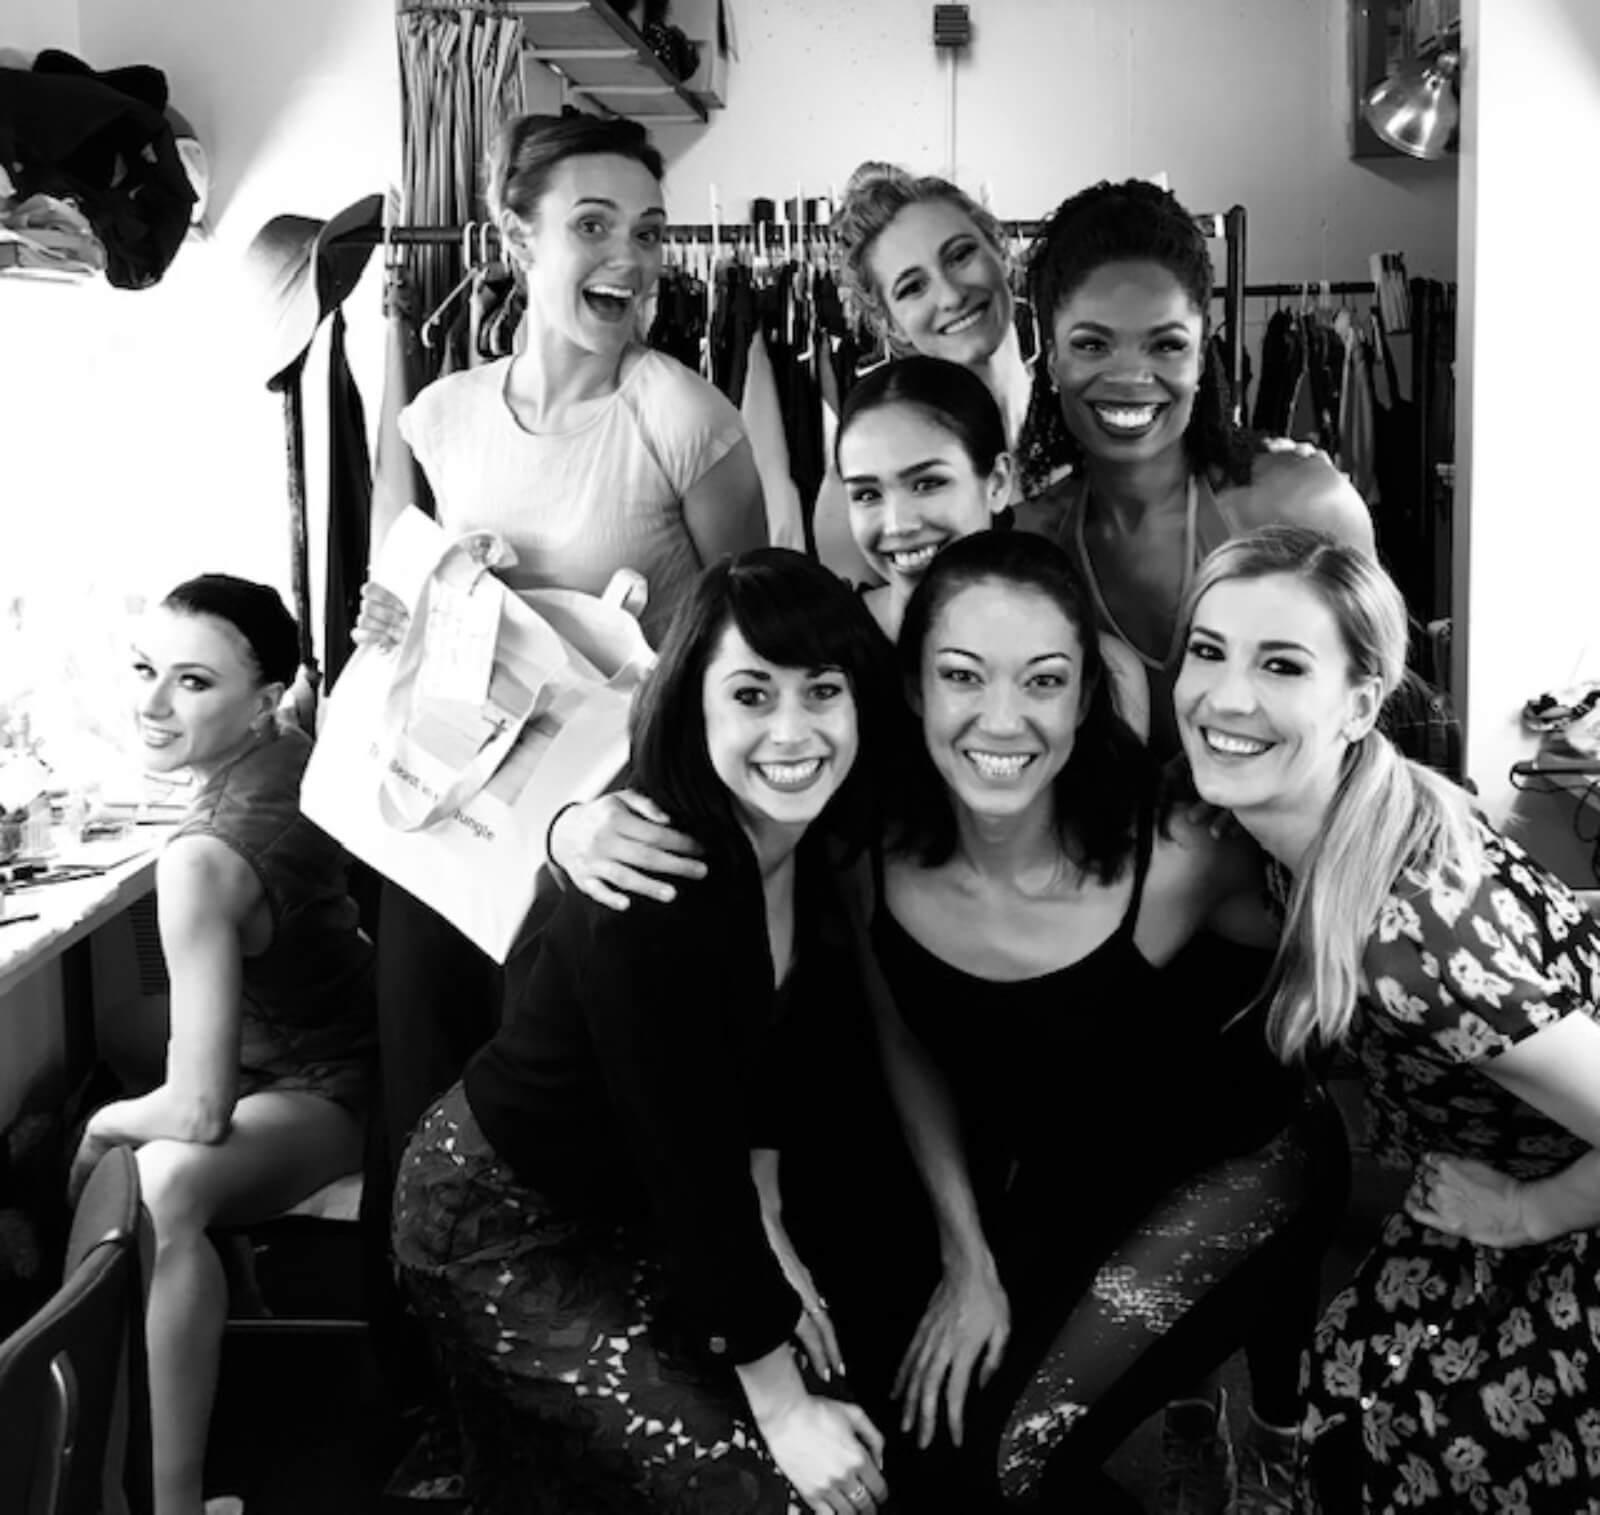 Irina Dvorovenko, Leah Hofmann, Sara Esty, Maira Barriga, Elizabeth Duga Crumrine, Naomi Kakuk, Erin N Moore, and Brittany Marcin Maschmeyer backstage at The Beast in the Jungle.